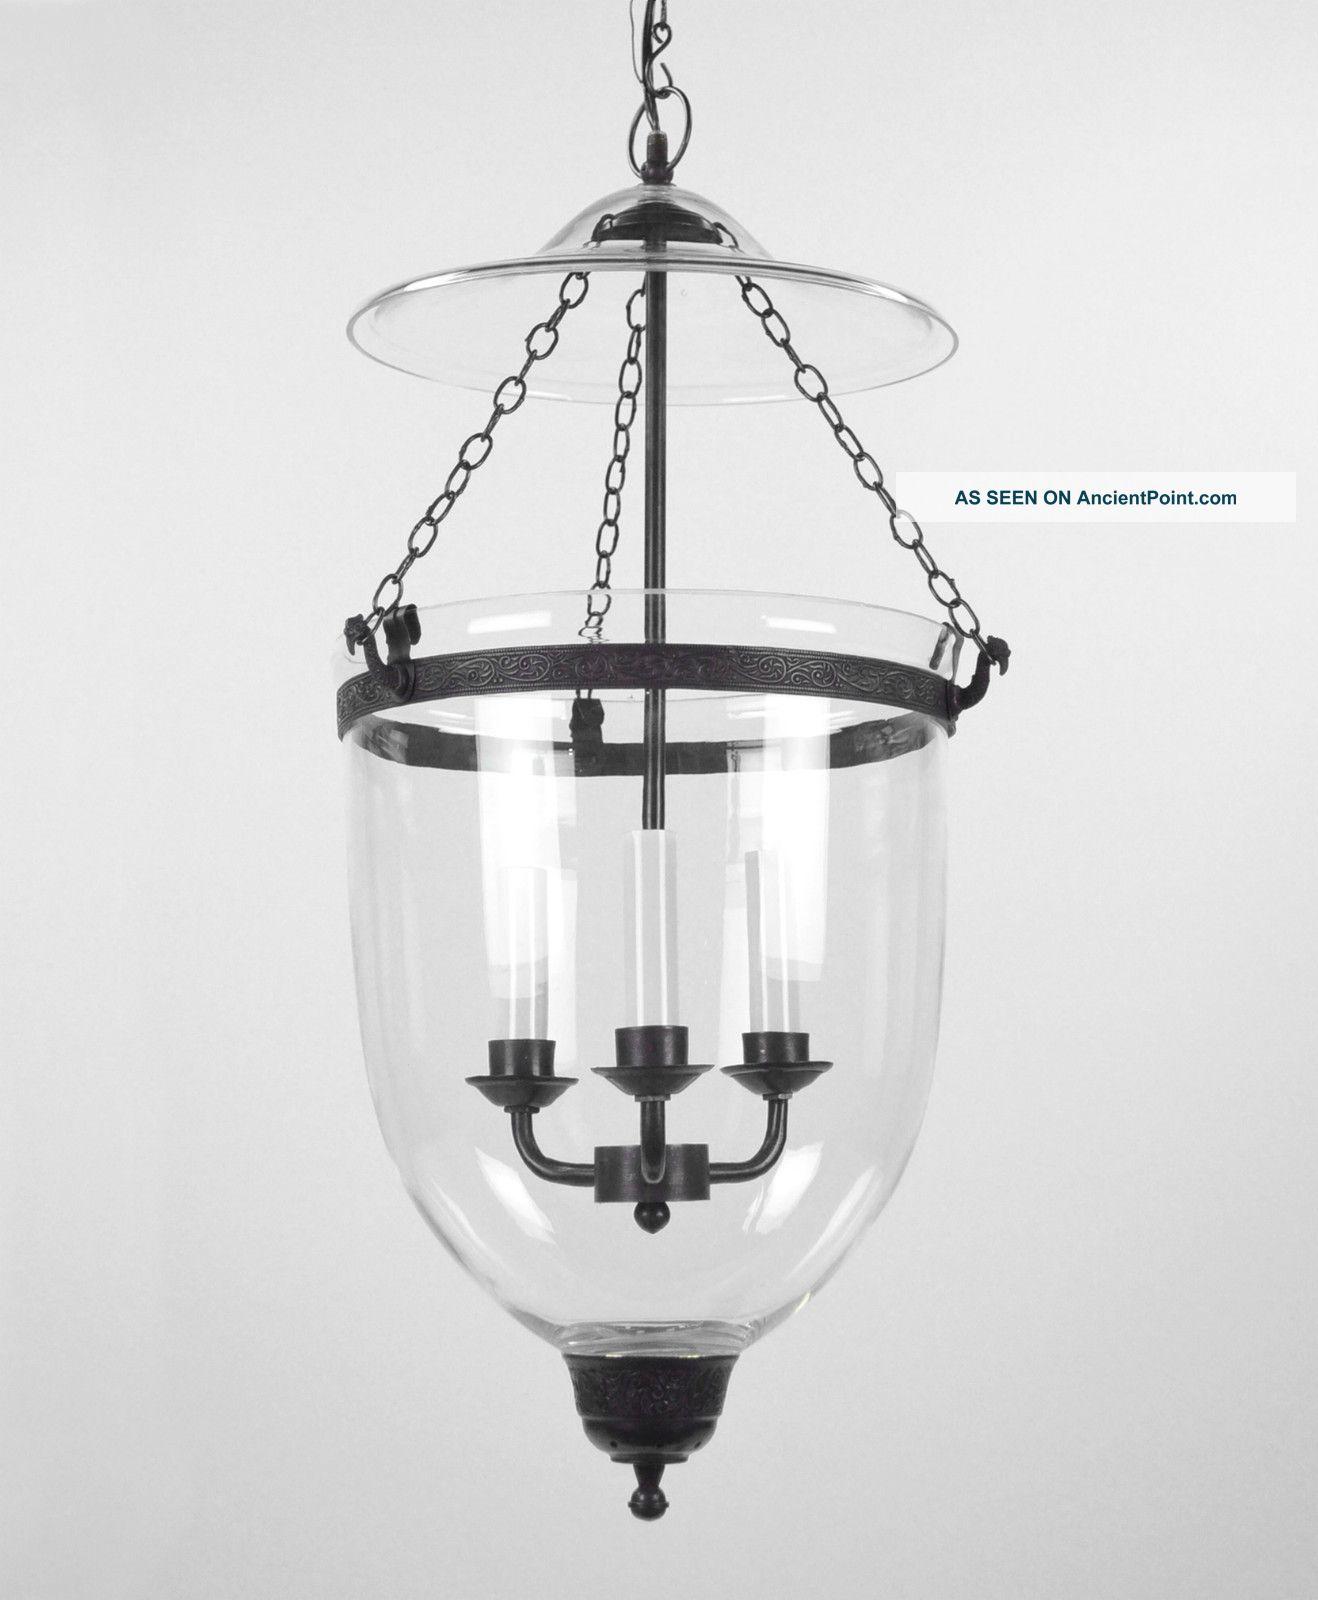 Large bell jar light chandelier pendant lantern glass colonial old large bell jar light chandelier pendant lantern glass colonial old antique style aloadofball Choice Image